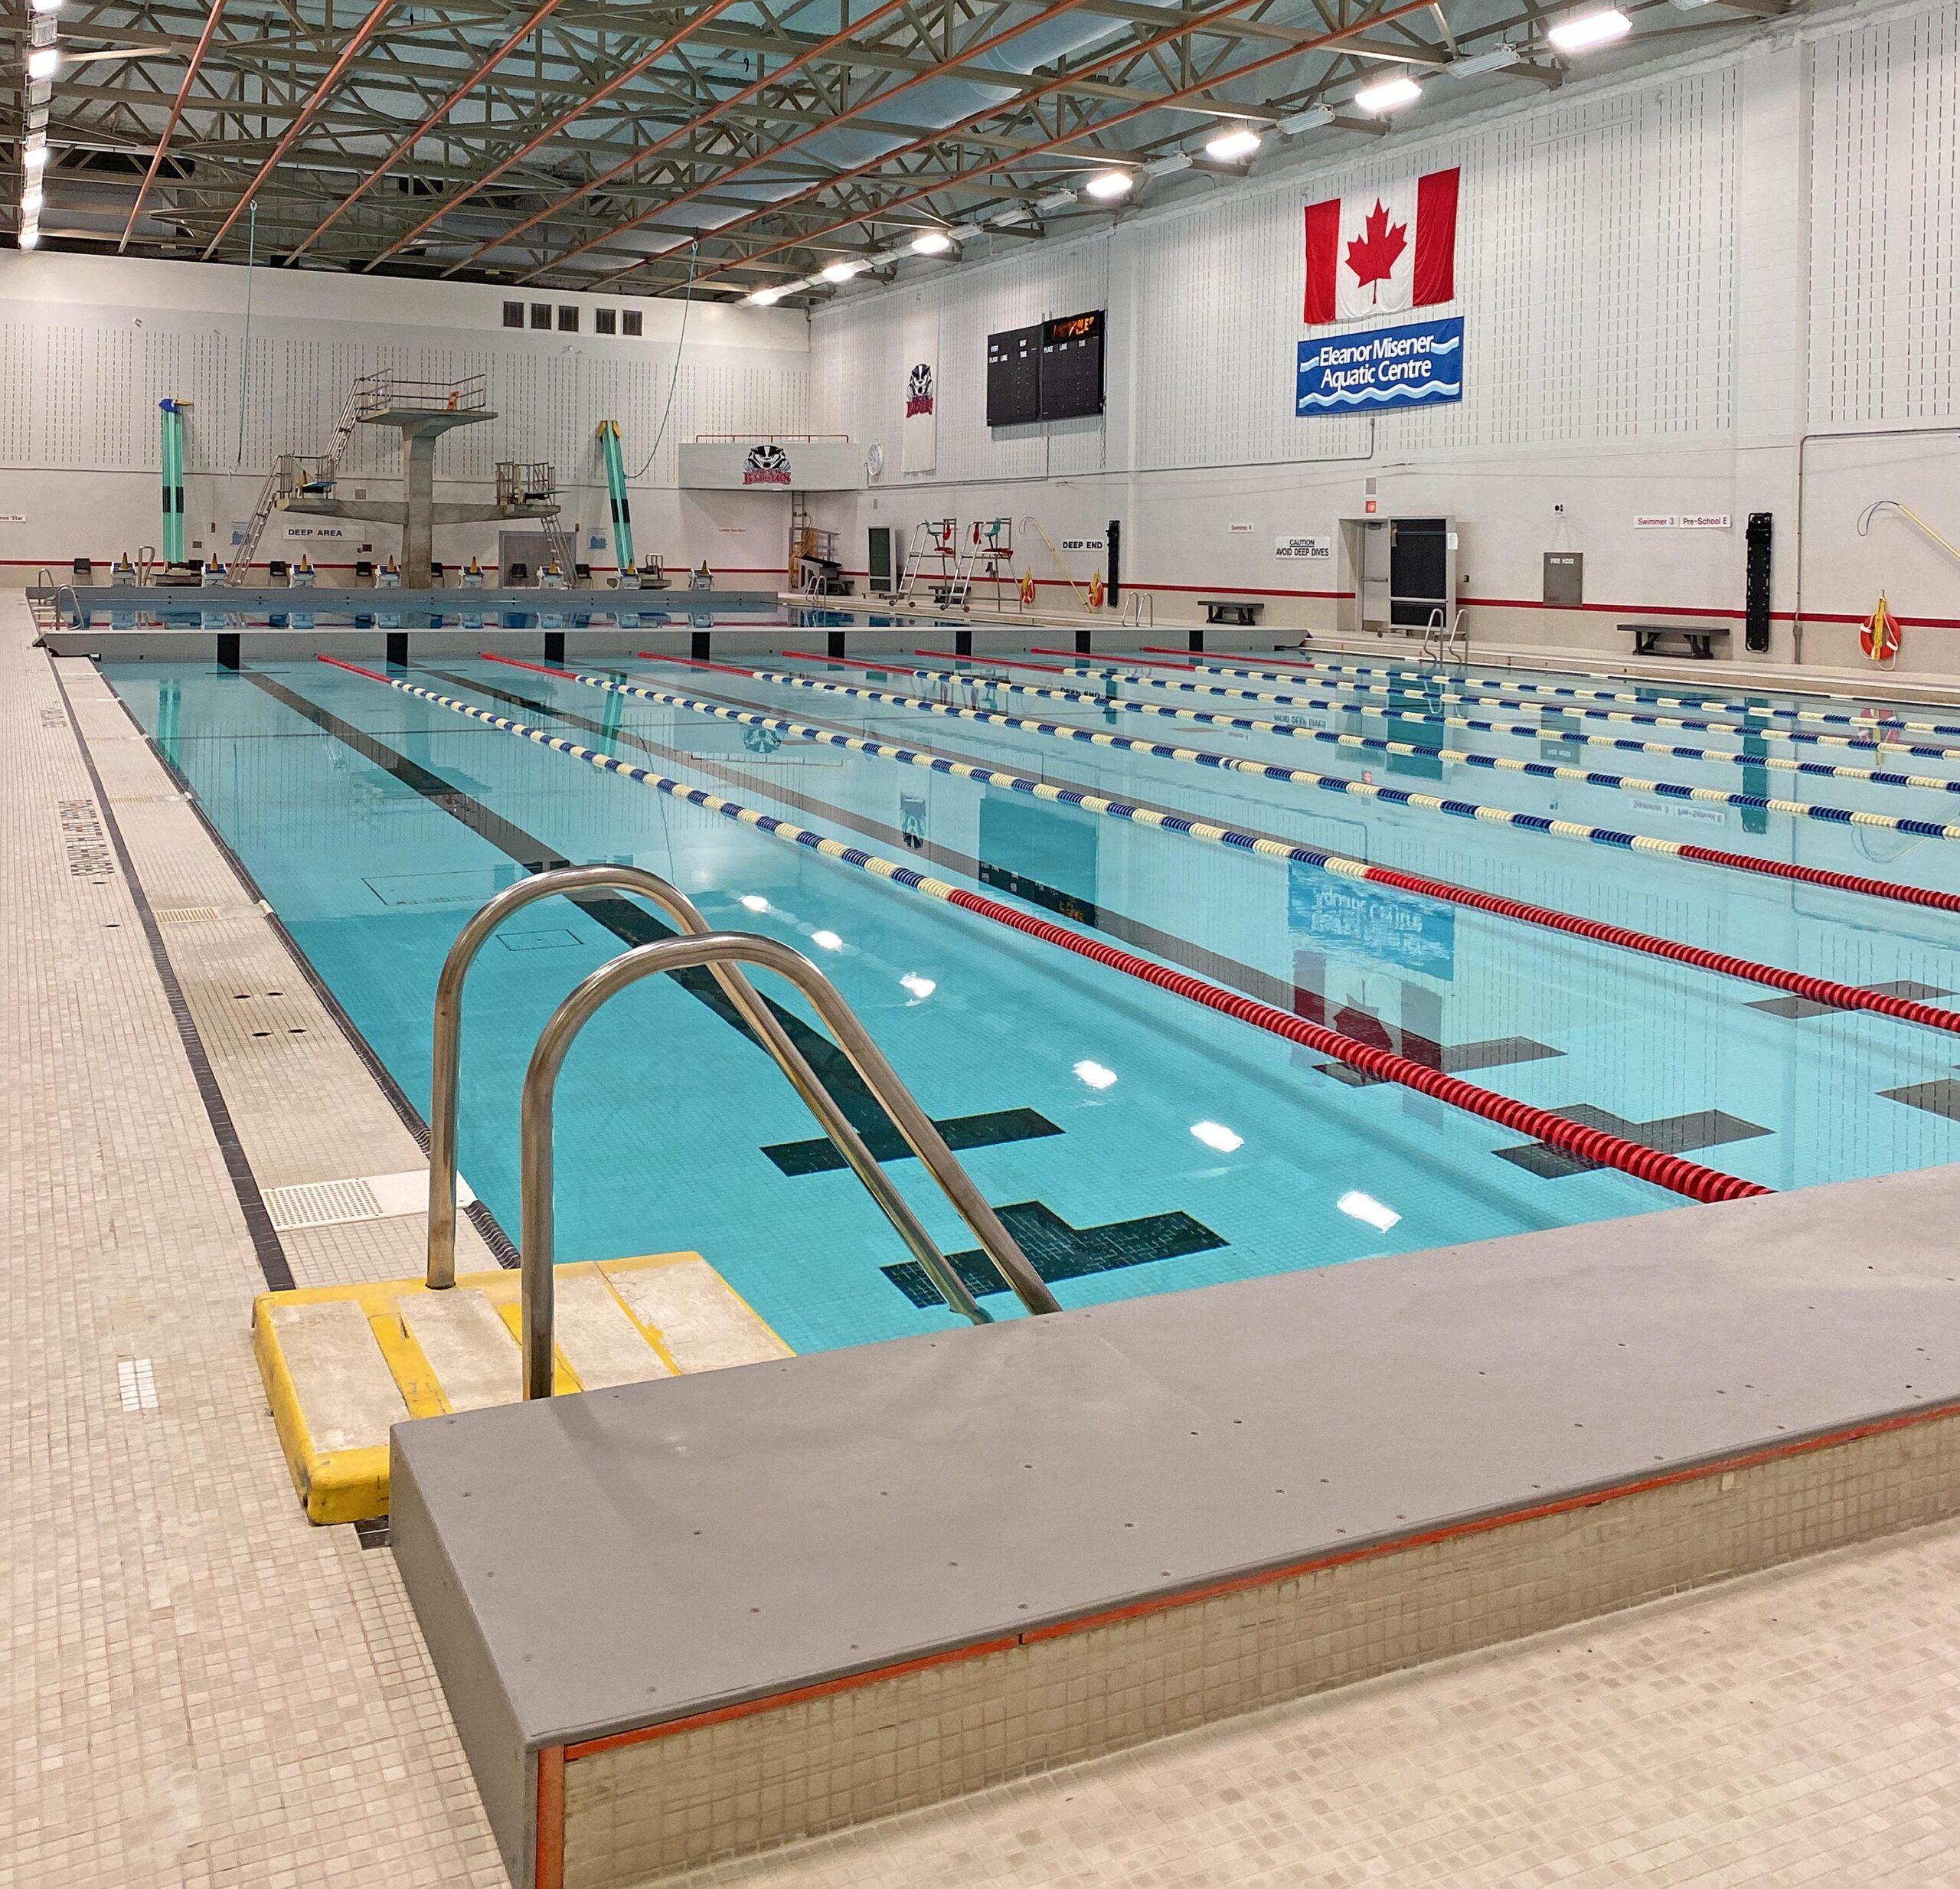 Brock University's indoor swimming facility.